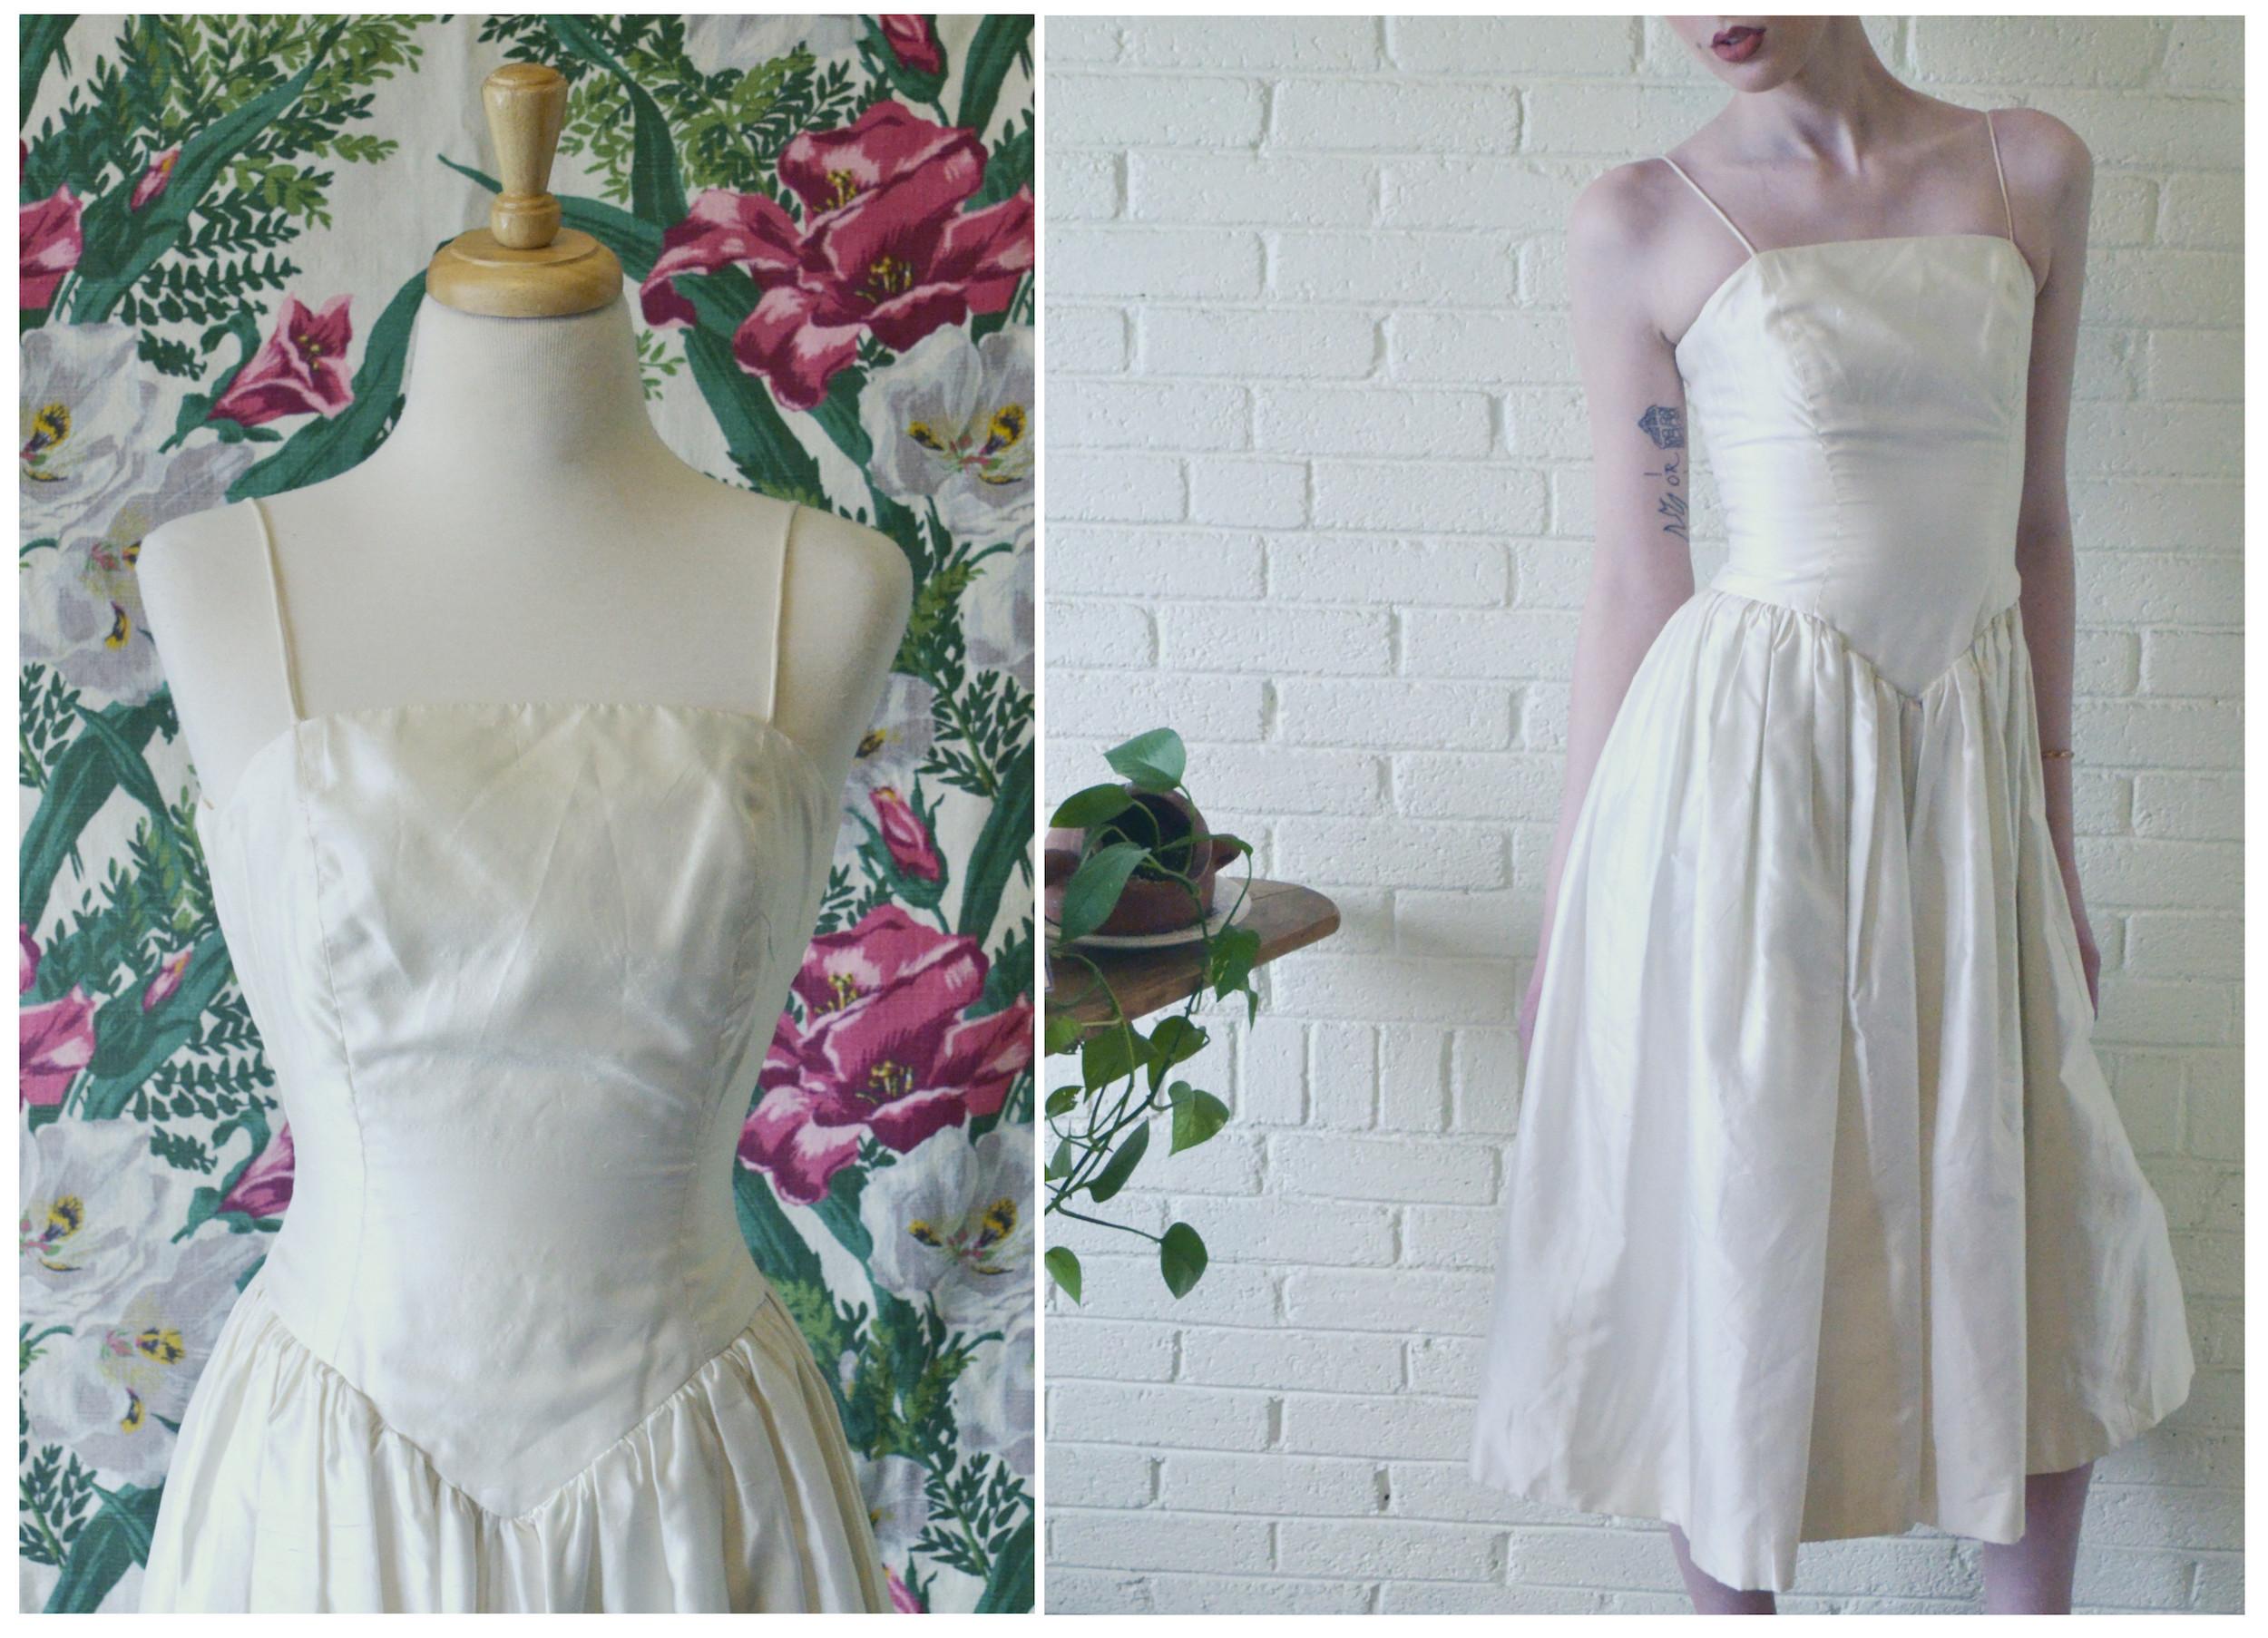 1980s Raw Silk Dress Detail.jpg